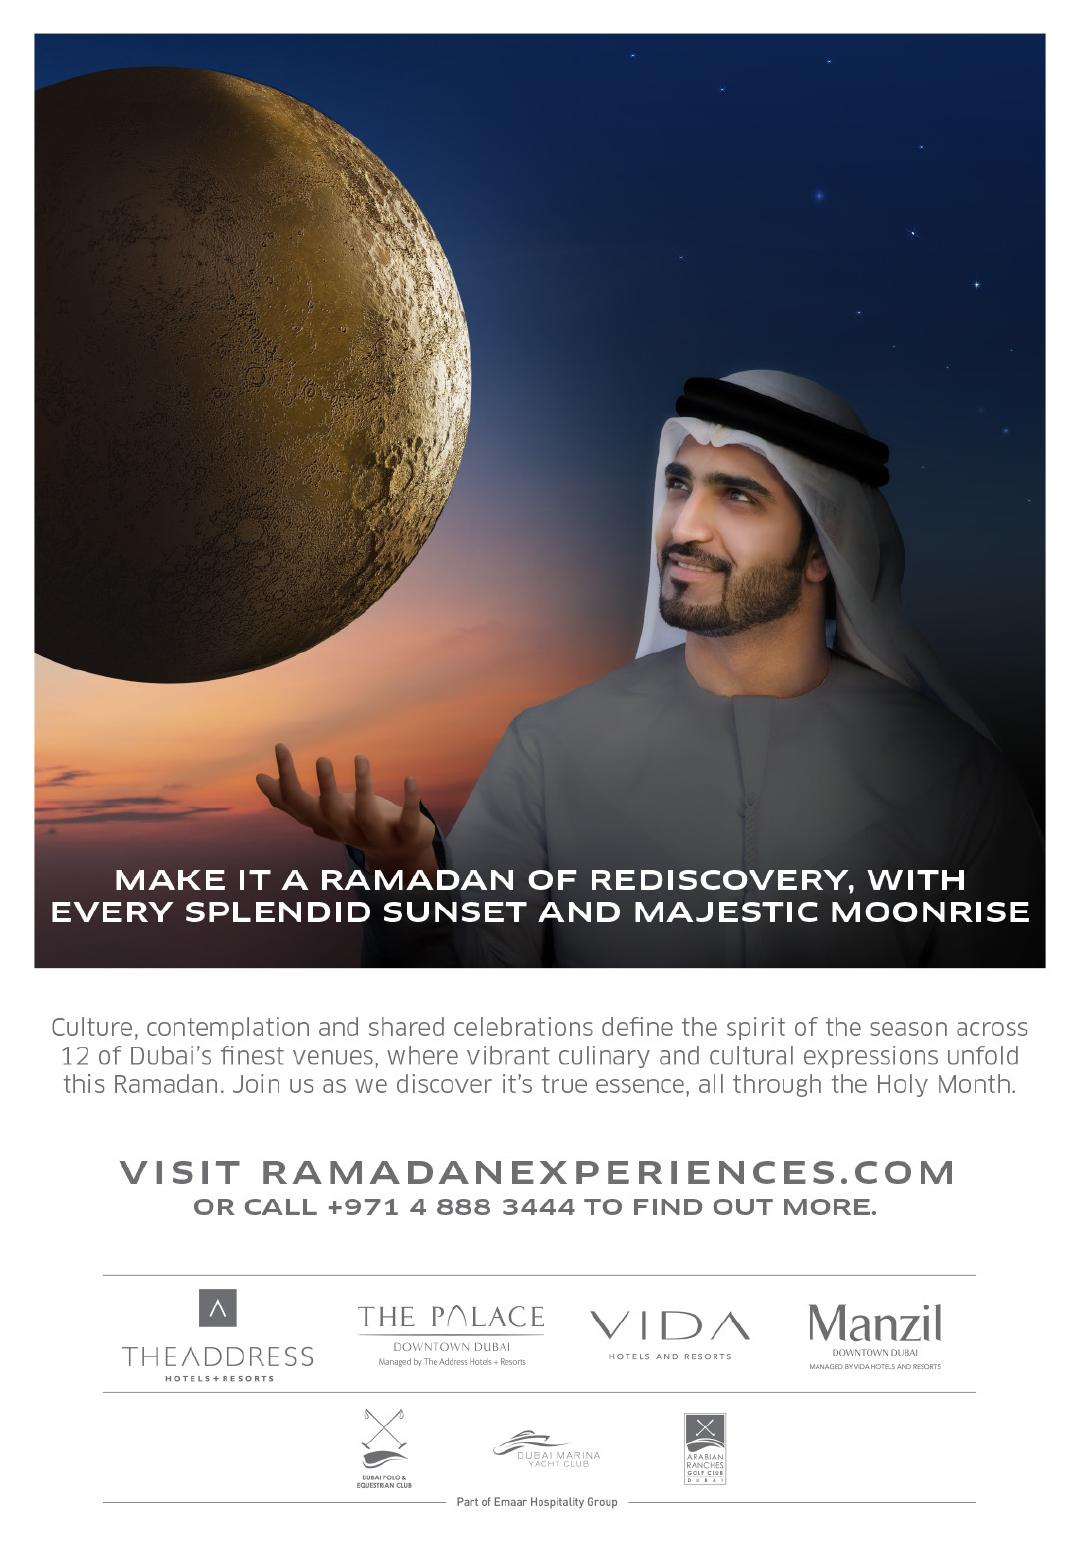 ehg-ramadan-2016-advert